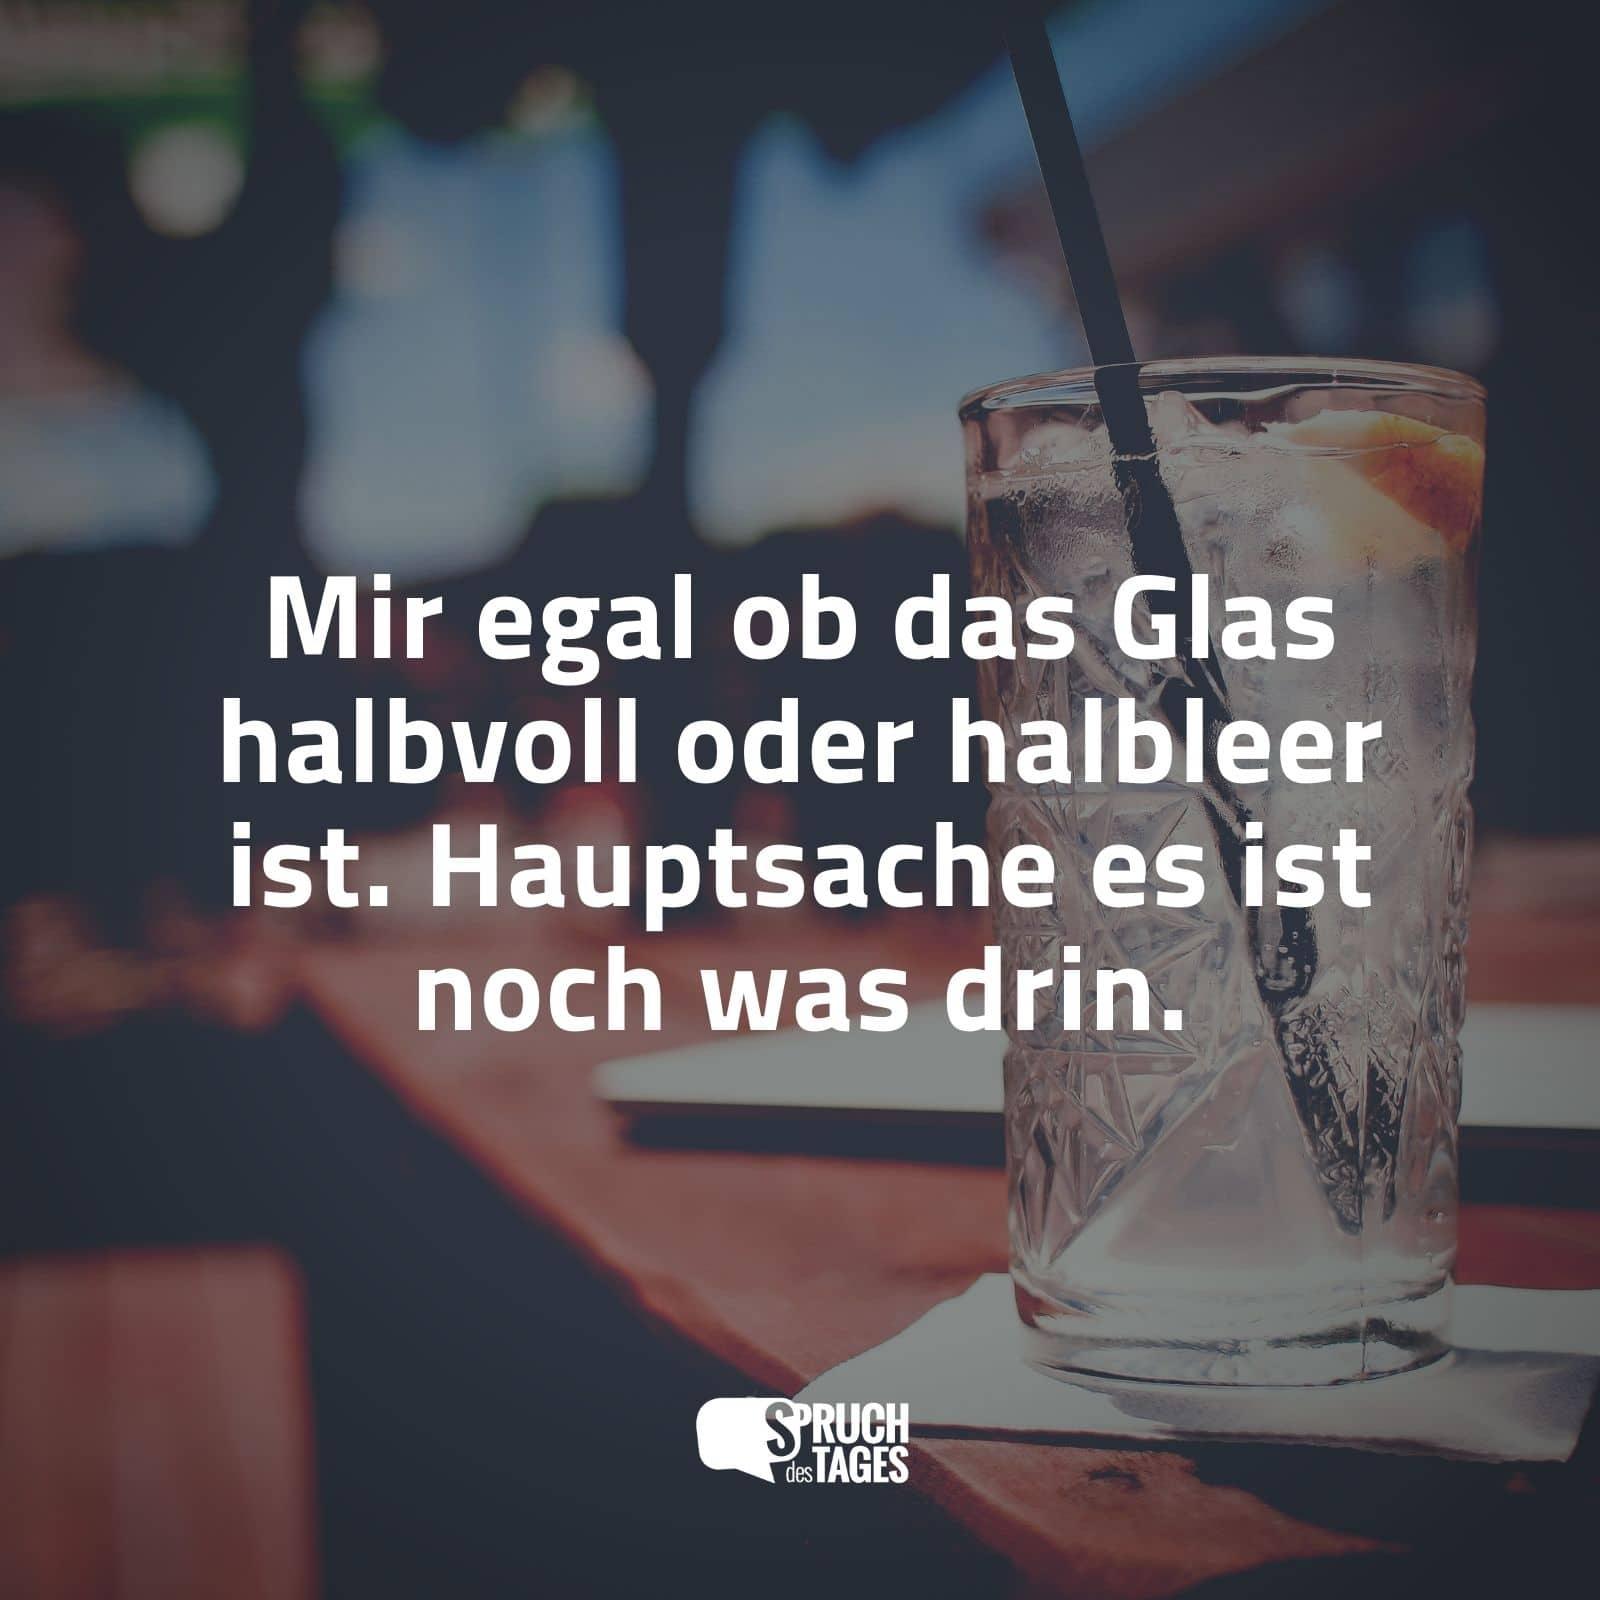 Mir Egal Ob Das Glas Halbvoll Oder Halbleer Ist Hauptsache